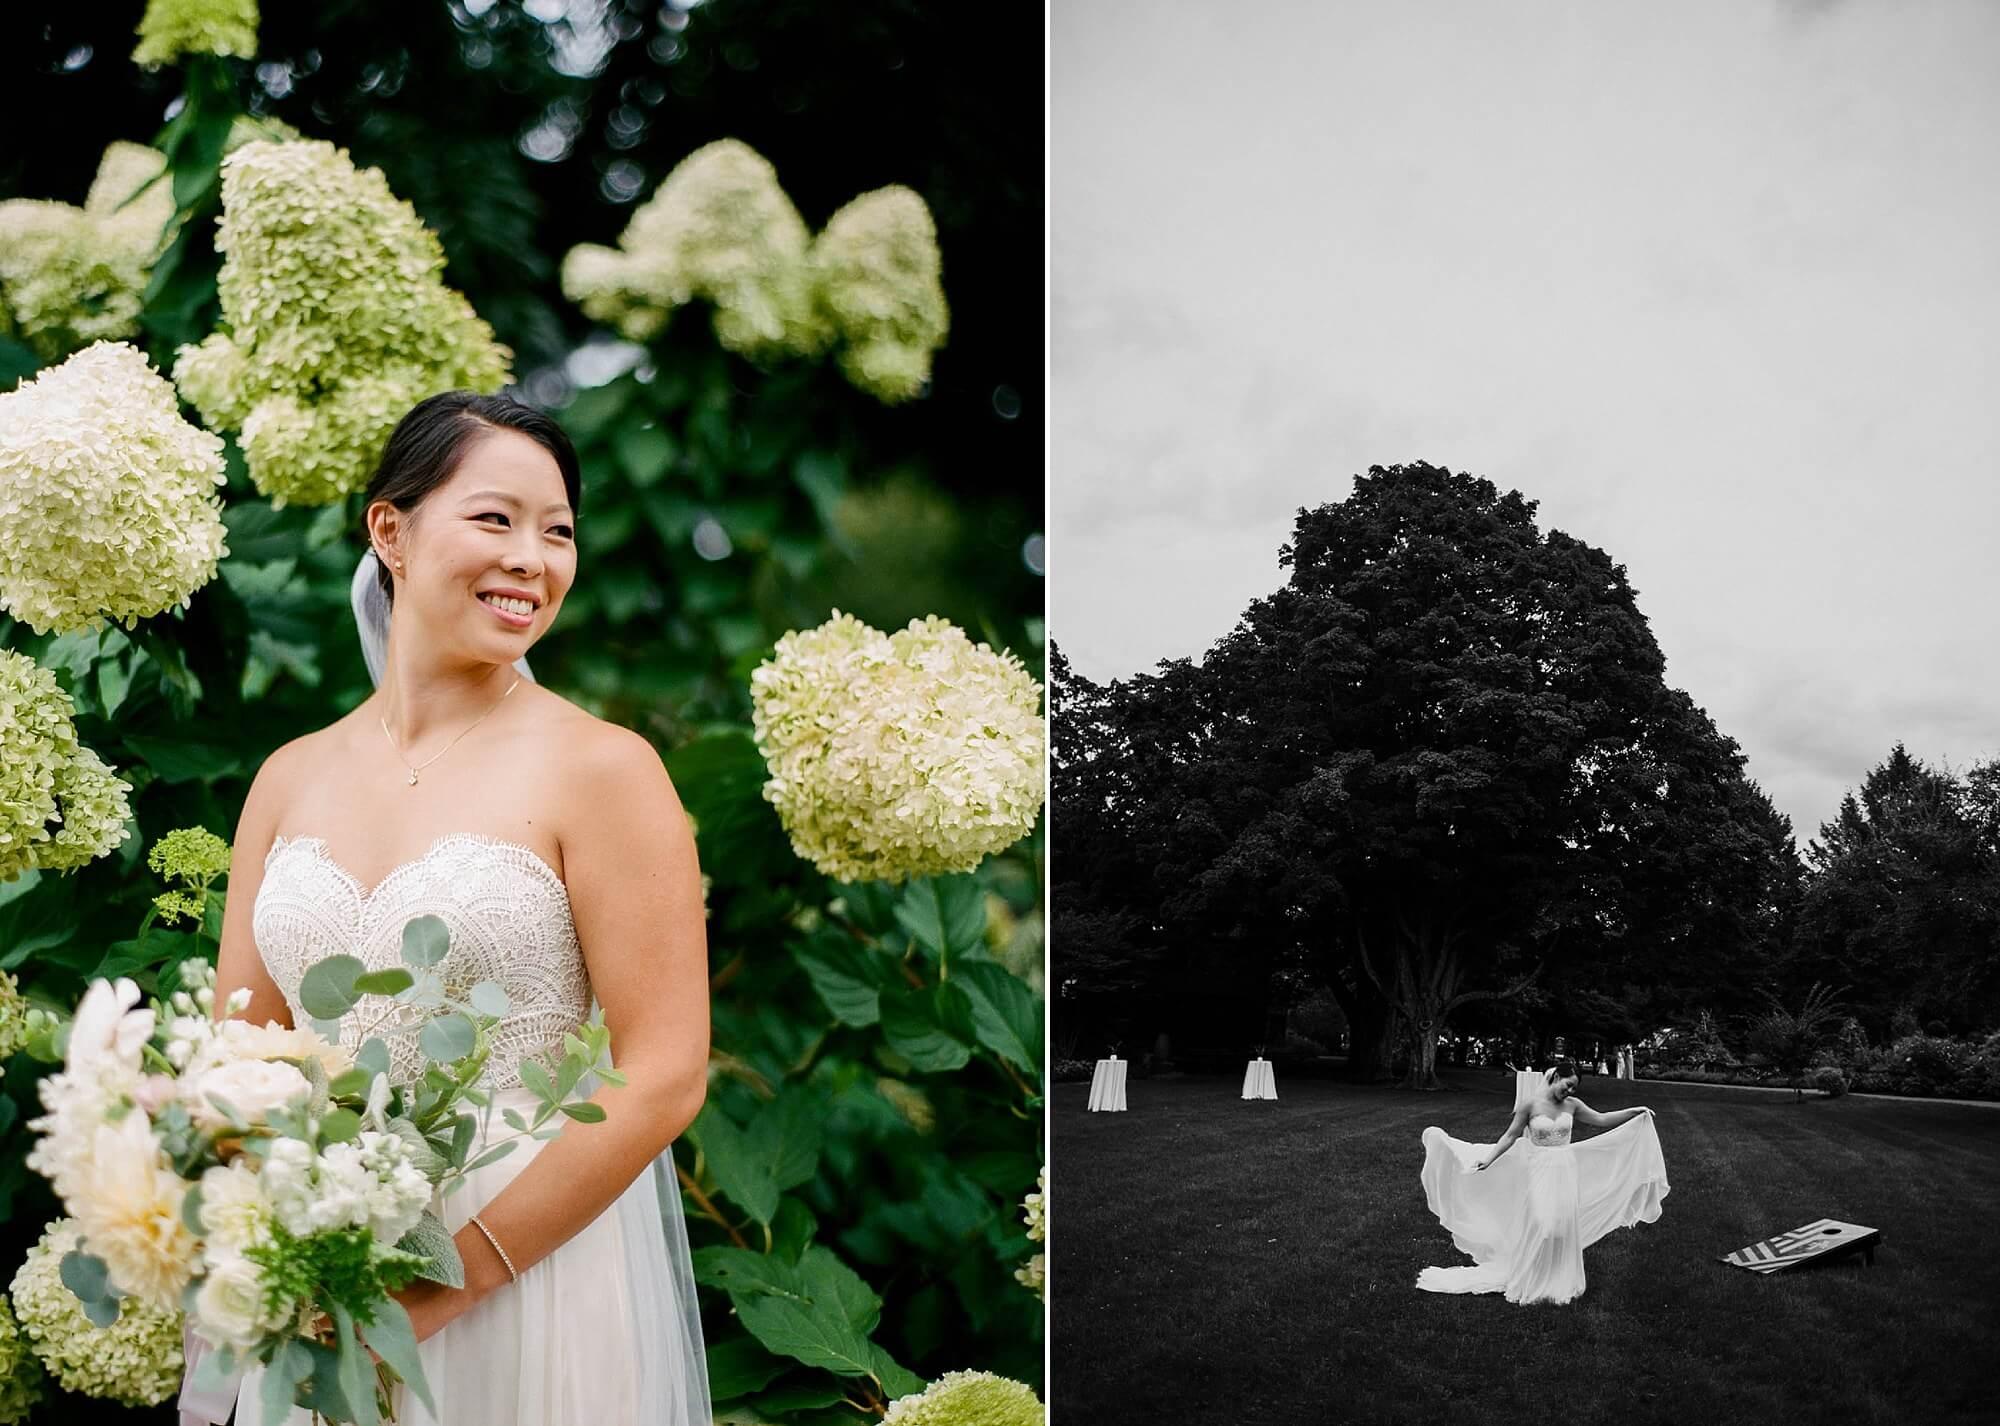 Gardens at Elm Bank wedding - Ebersole Photography -7.jpg